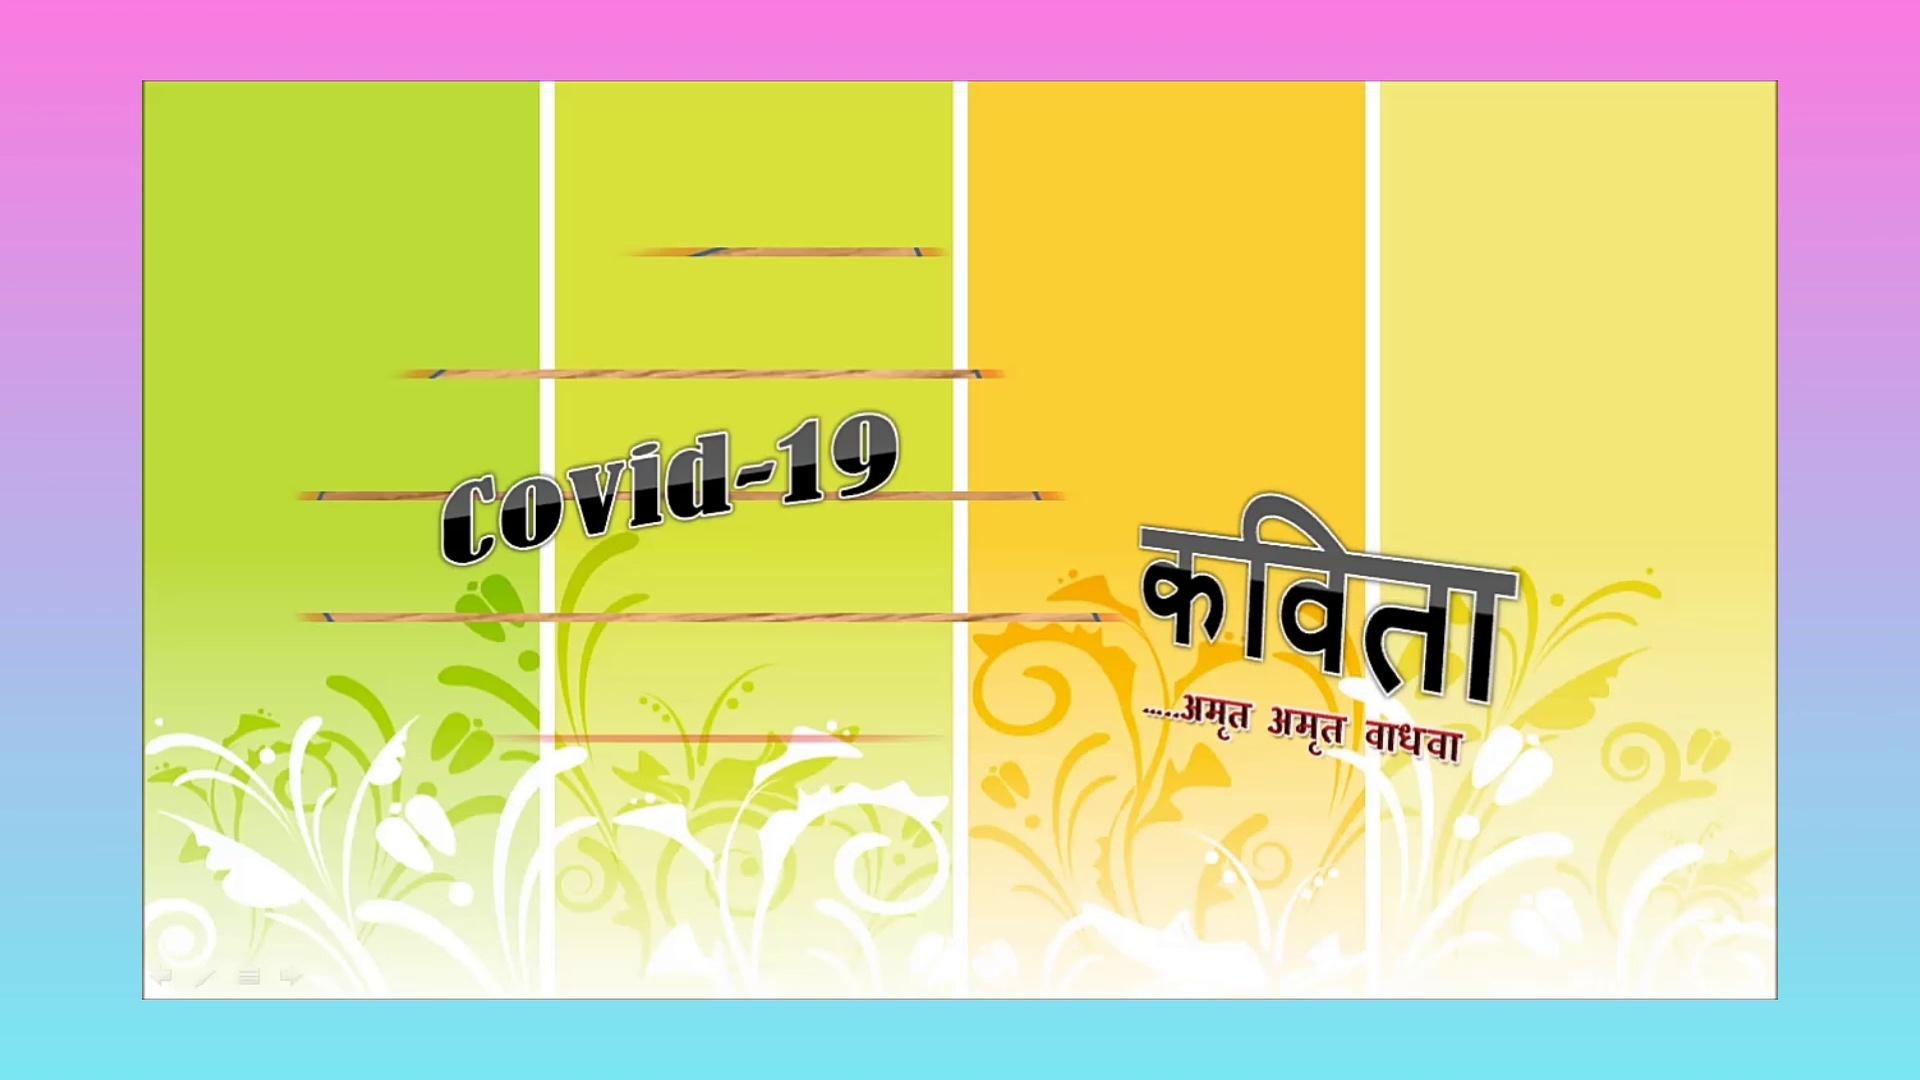 Covid-19 hindi poem